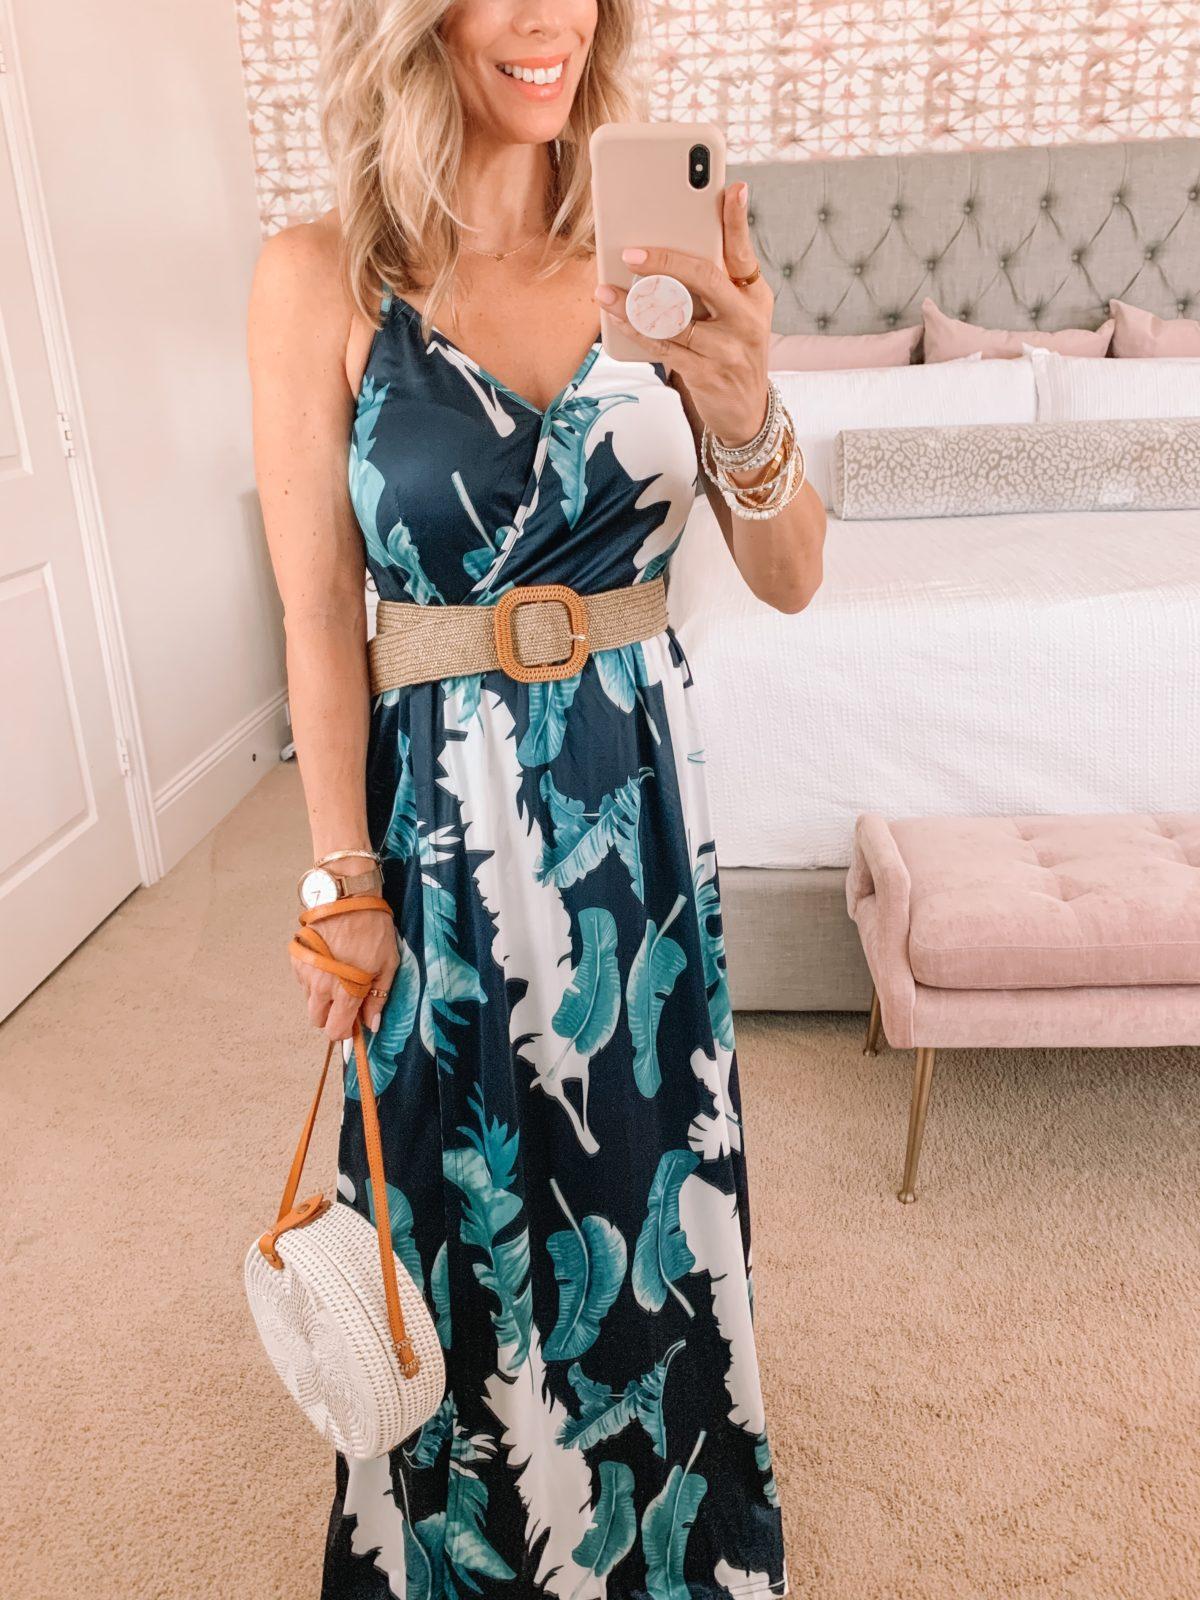 Amazon Fashion Faves, Floral Maxi Dress and Circle Crossbody